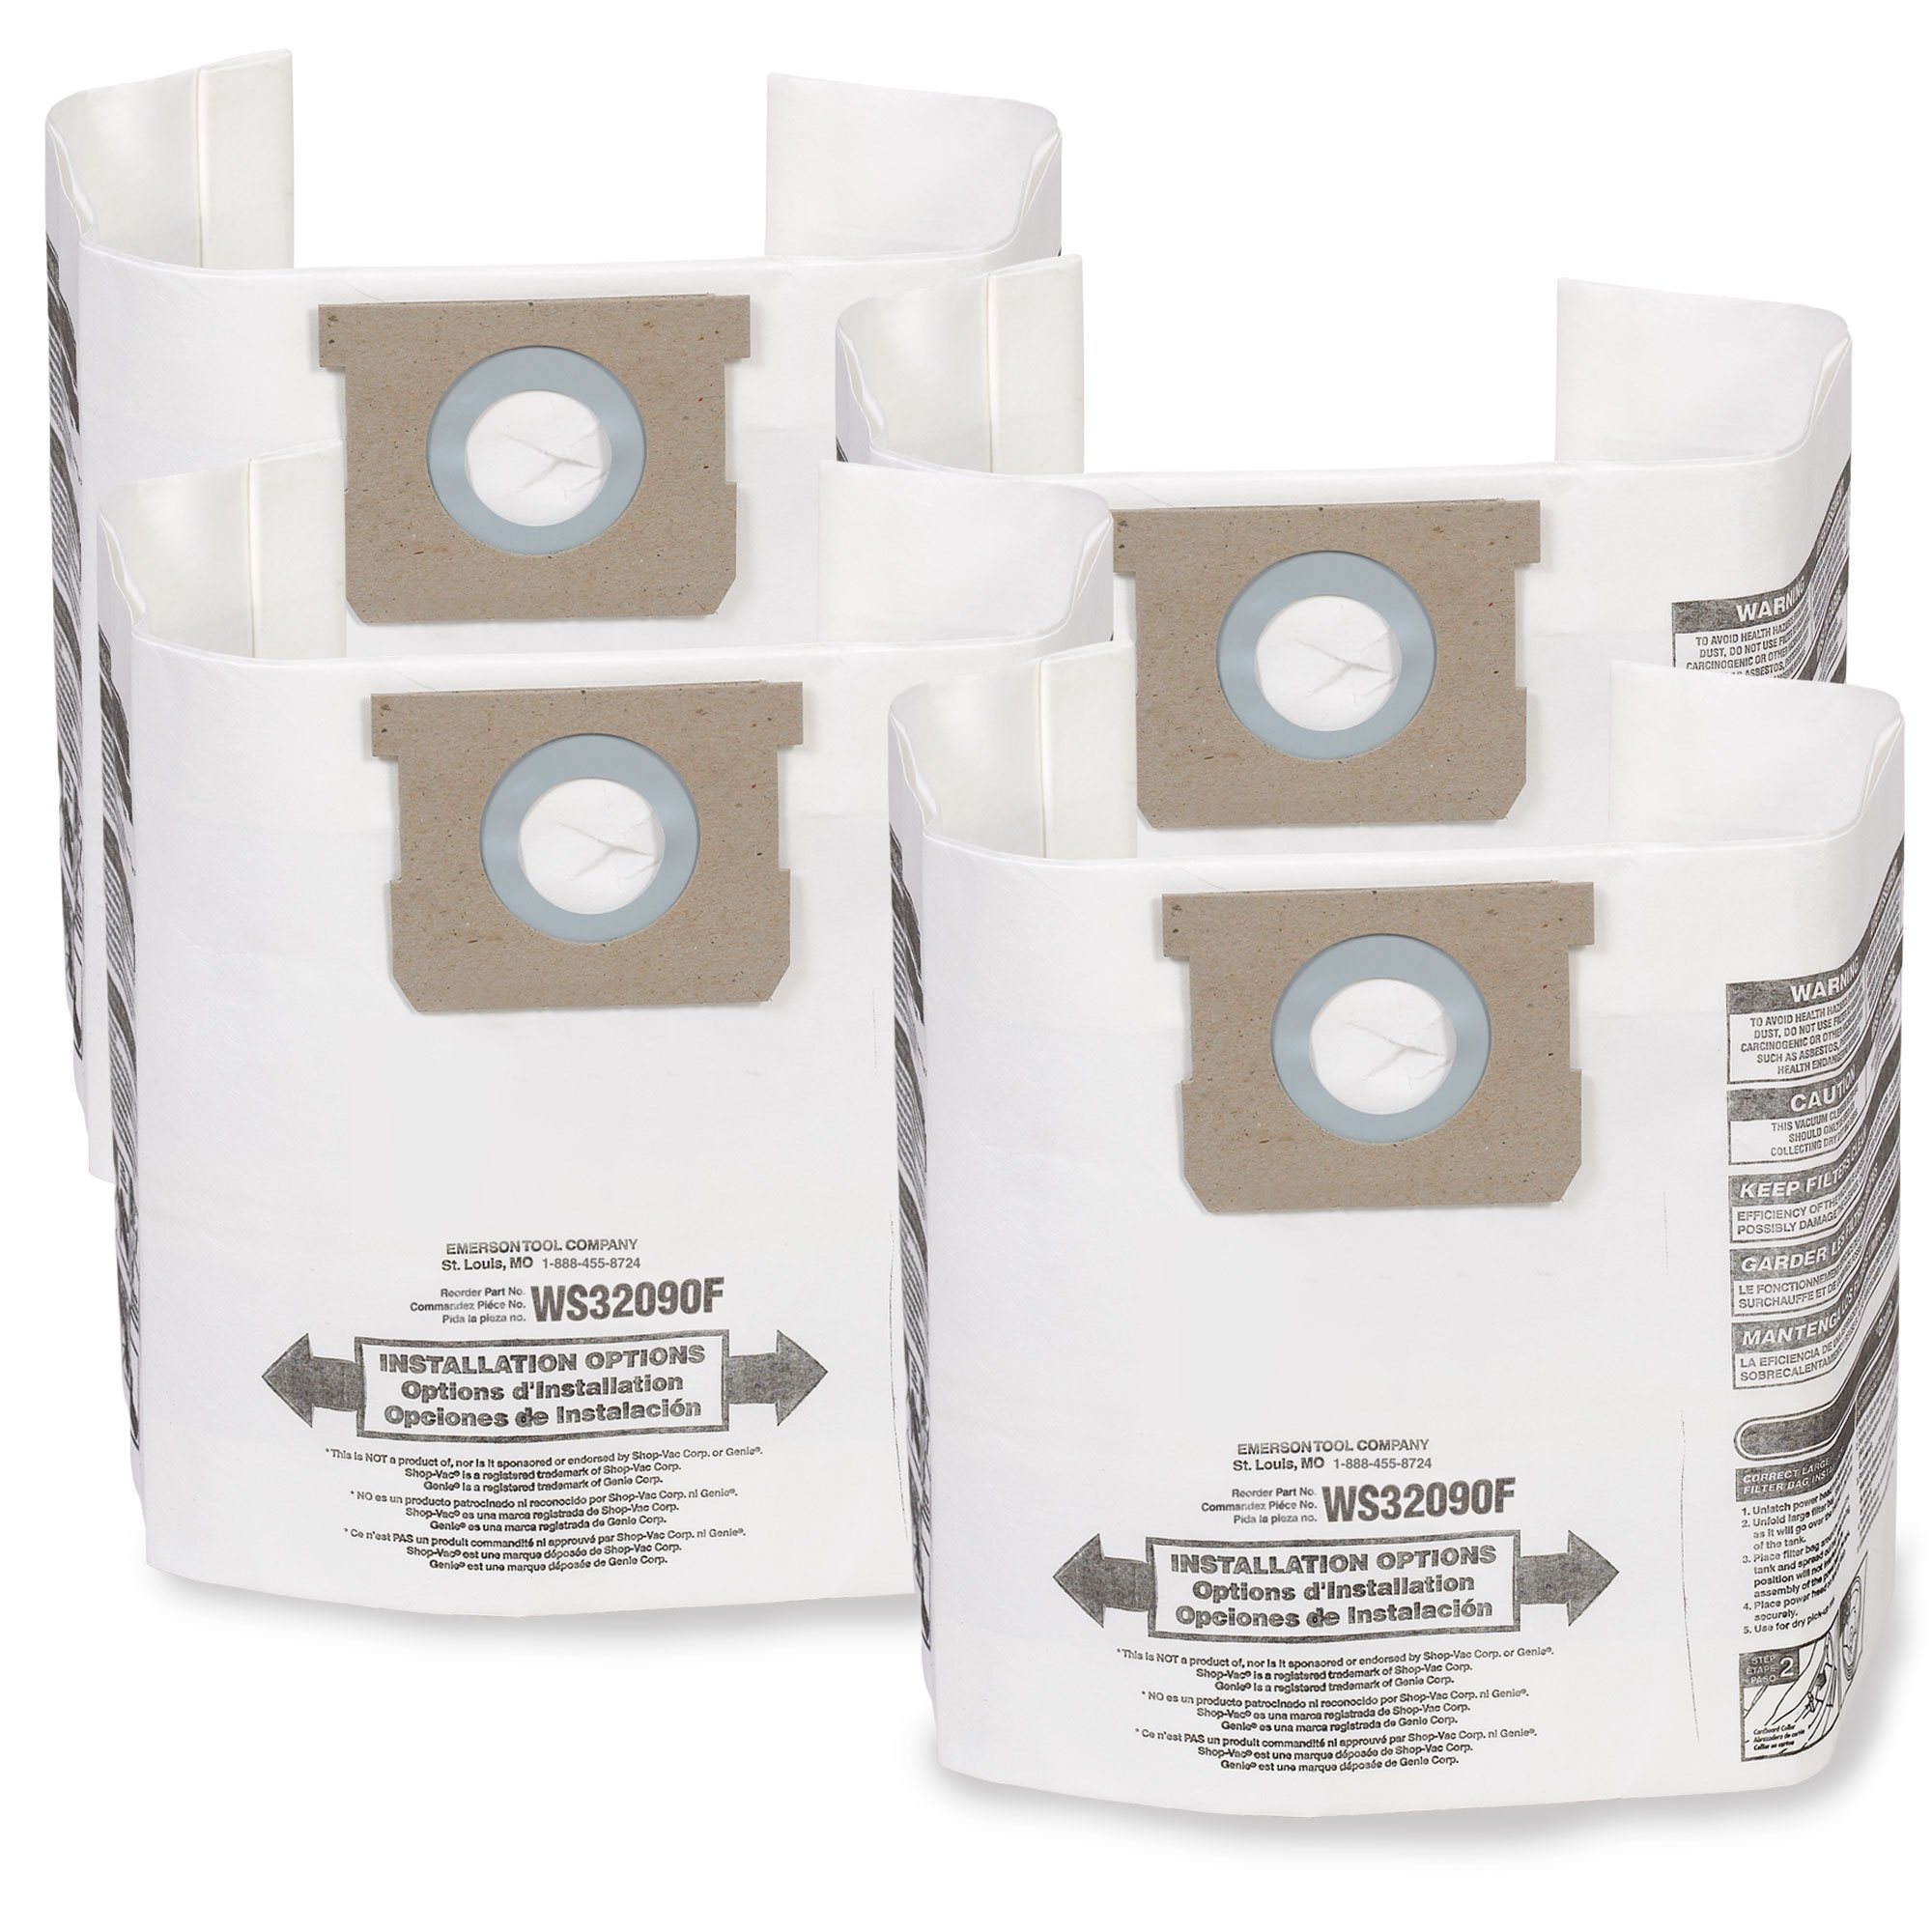 WORKSHOP Wet Dry Vacuum Bags WS32090F2 Fine Dust Collection Shop Vacuum Bags (2-Pack / 4 Shop Vacuum Bags), Bag Filter For WORKSHOP 5-Gallon To 9-Gallon Shop Vacuum Cleaners by WORKSHOP Wet/Dry Vacs (Image #1)